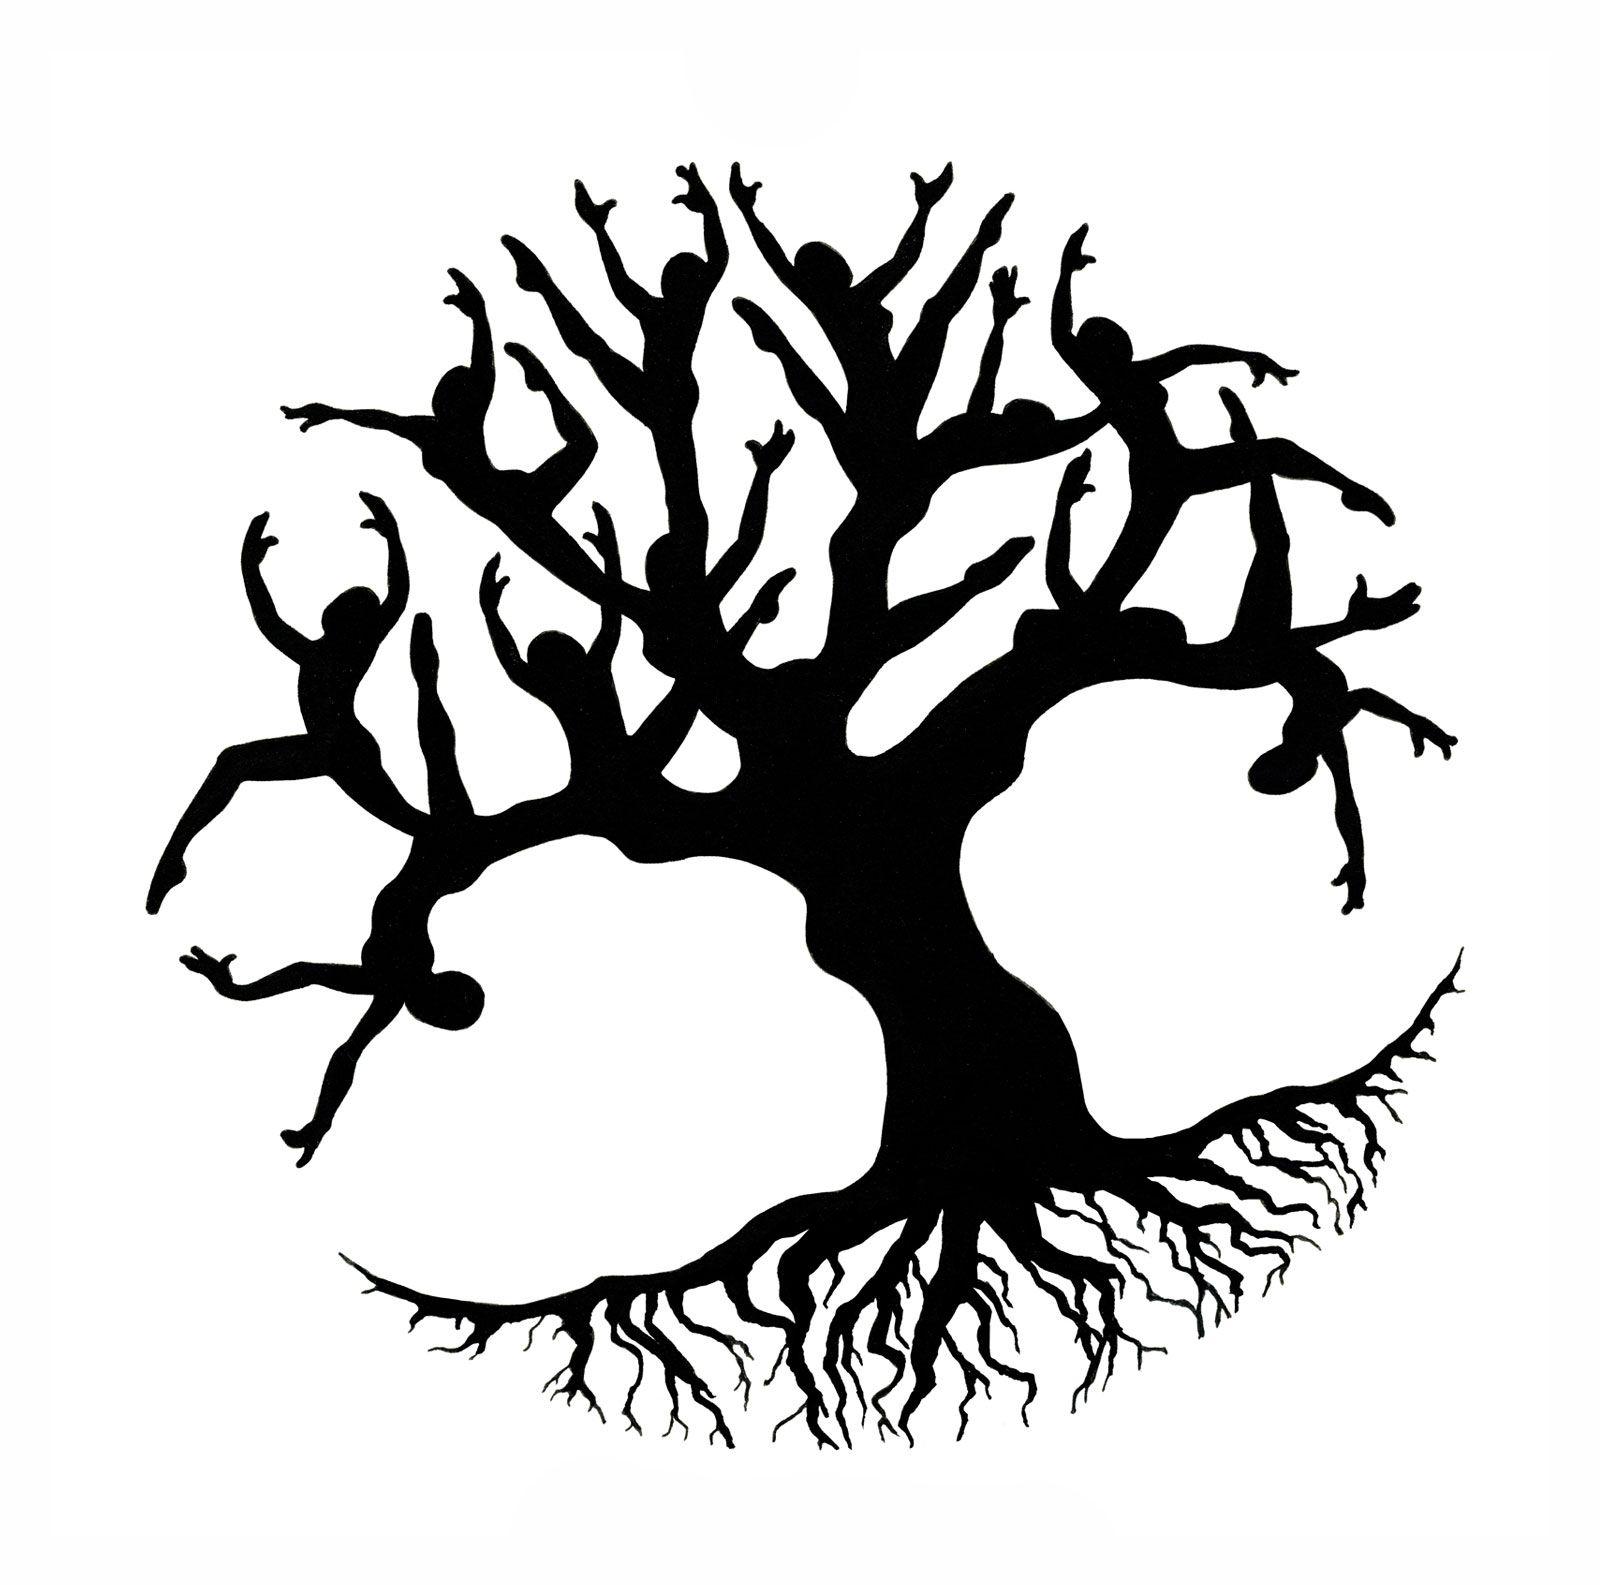 Line Drawing Tree Tattoo : Tree of life line drawing s pinterest